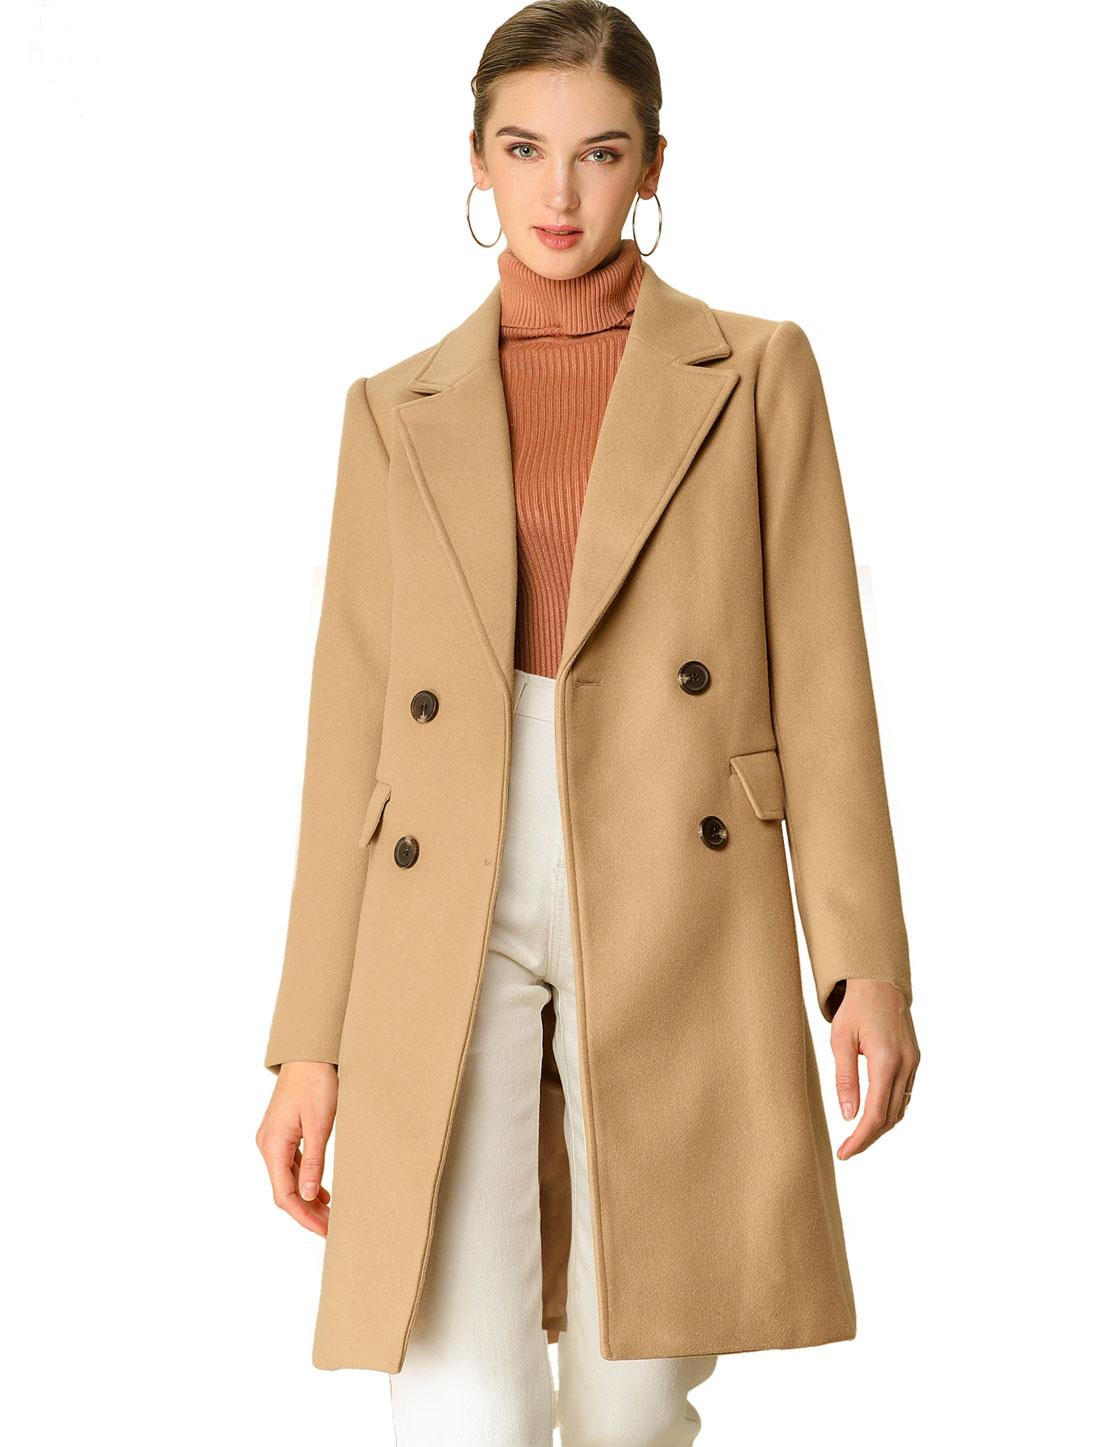 Allegra K Women's button Belt Long Jacket PeaTrench Coat Khaki XL (US 18)